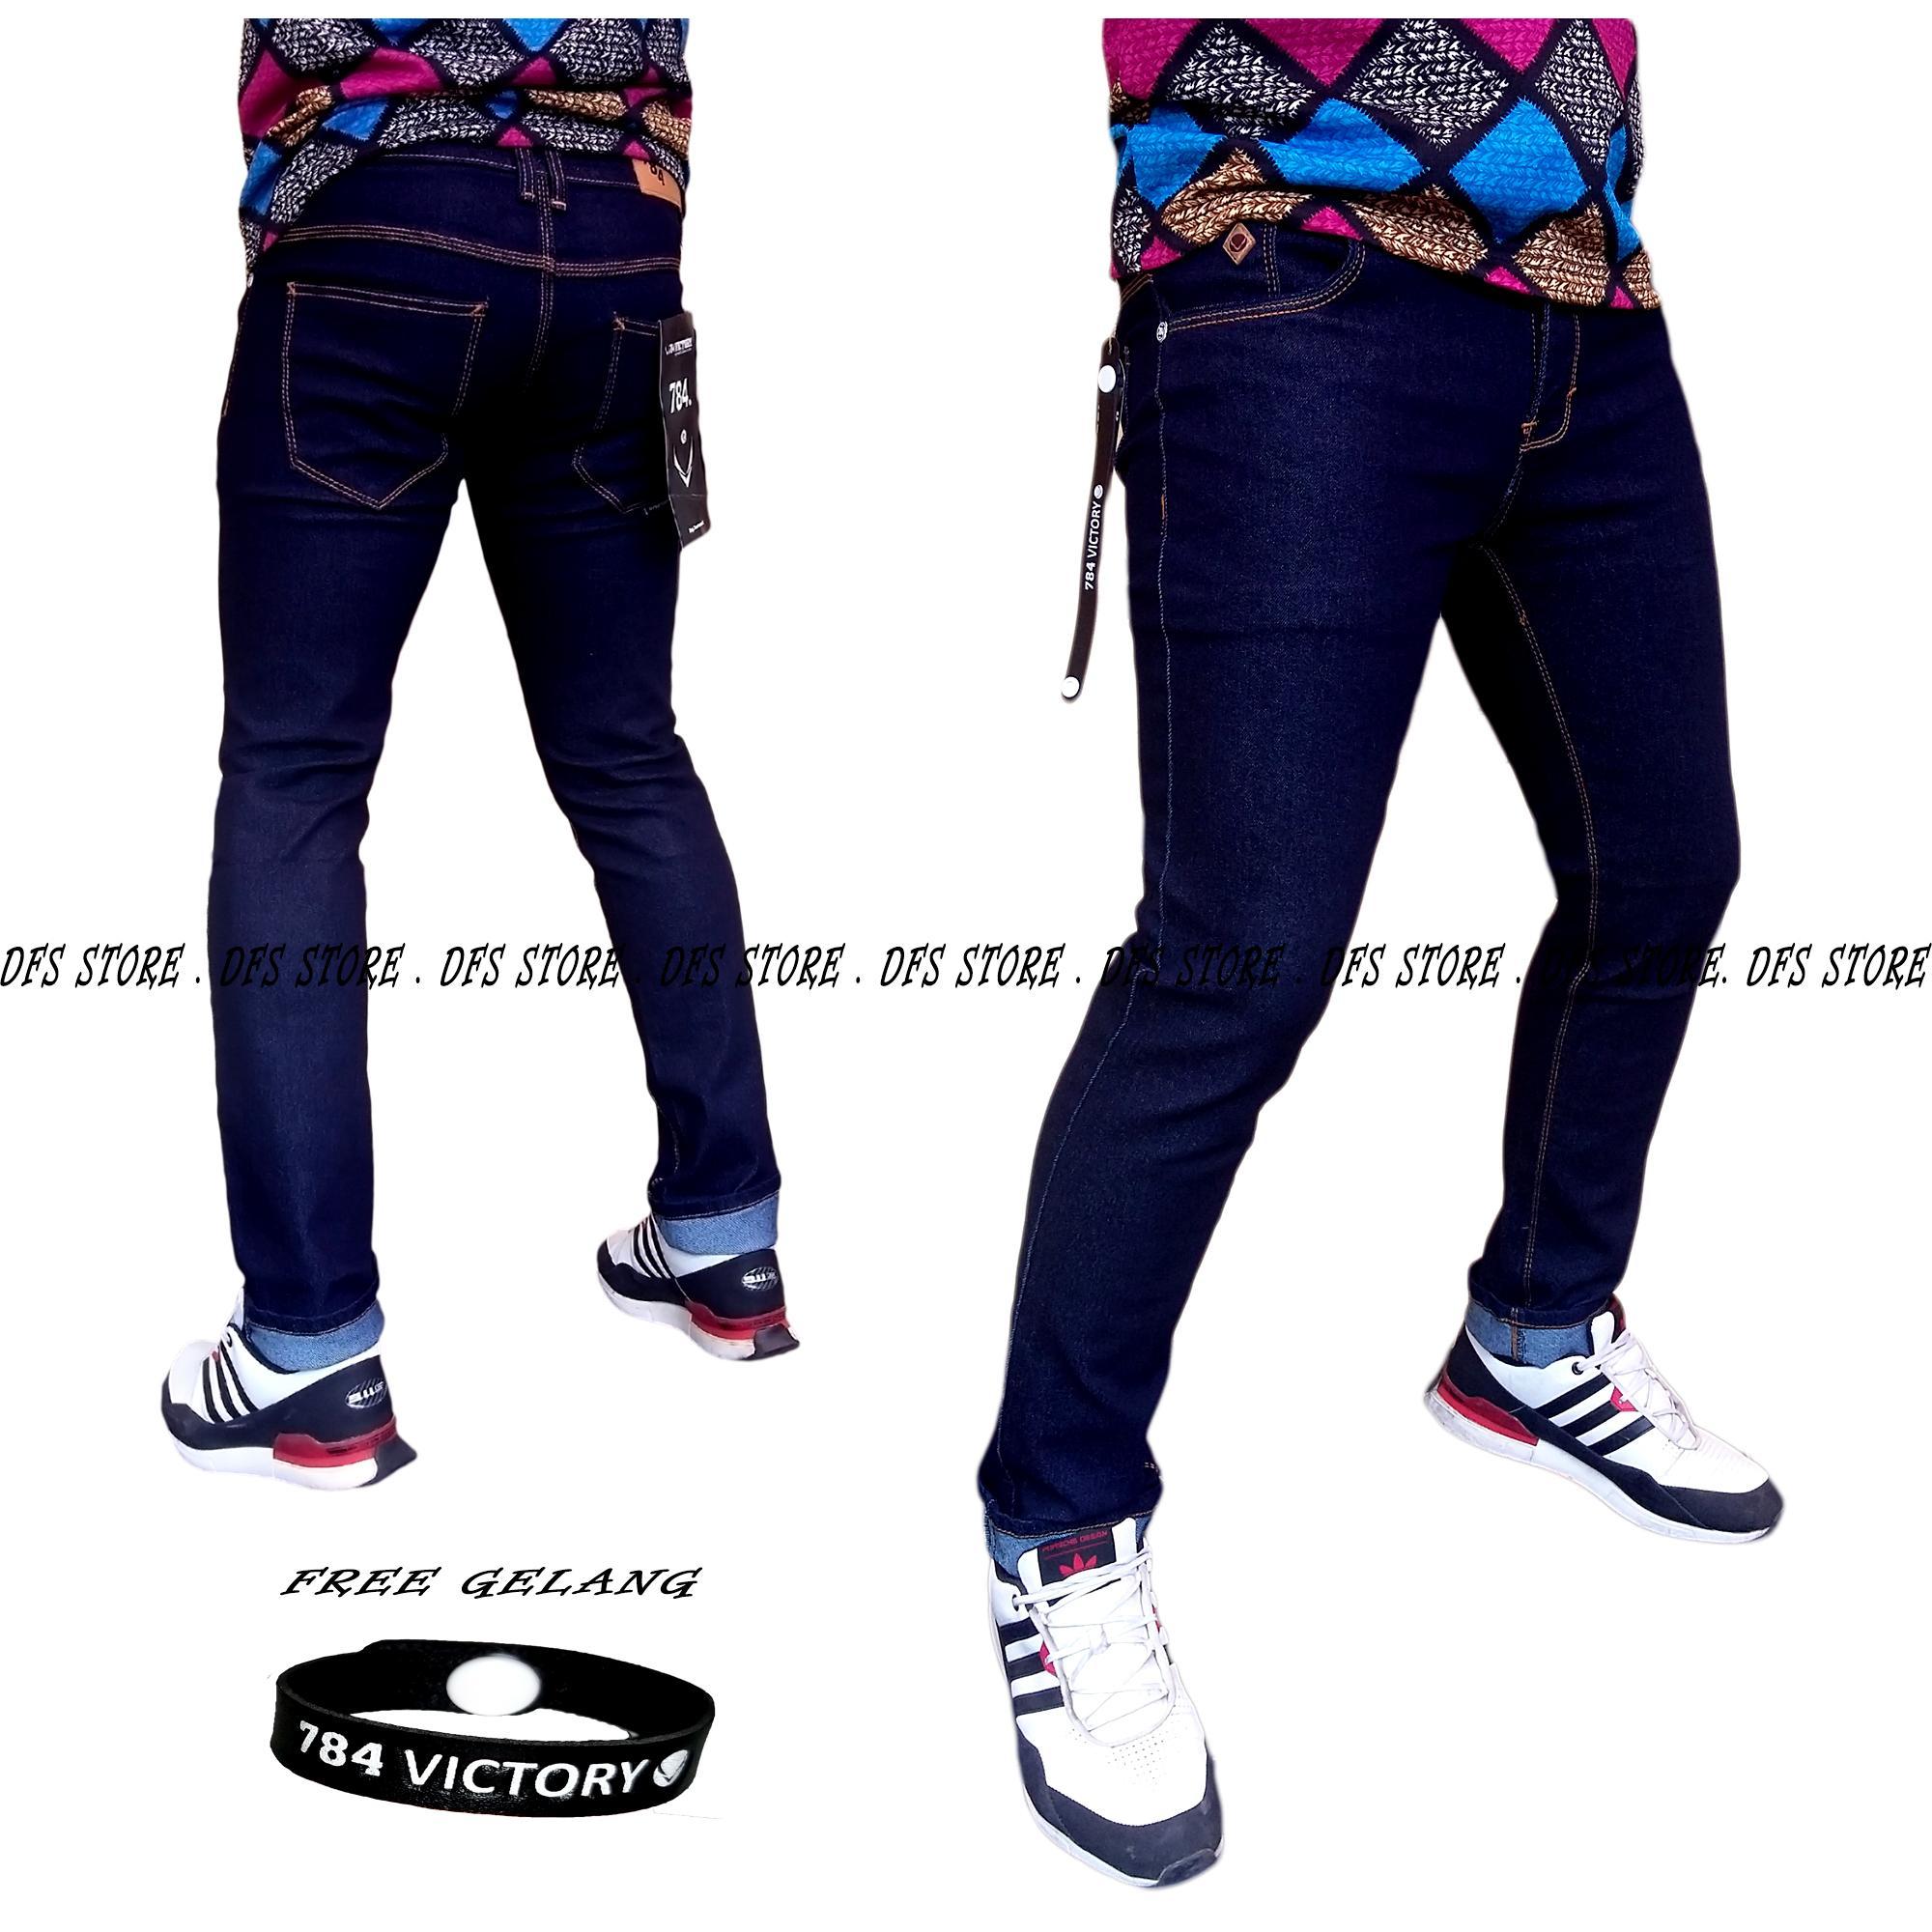 DFS-784 VICTORY DENIM Celana jeans denim skinny / slimfit / pensil pria – BIRU DONGKER